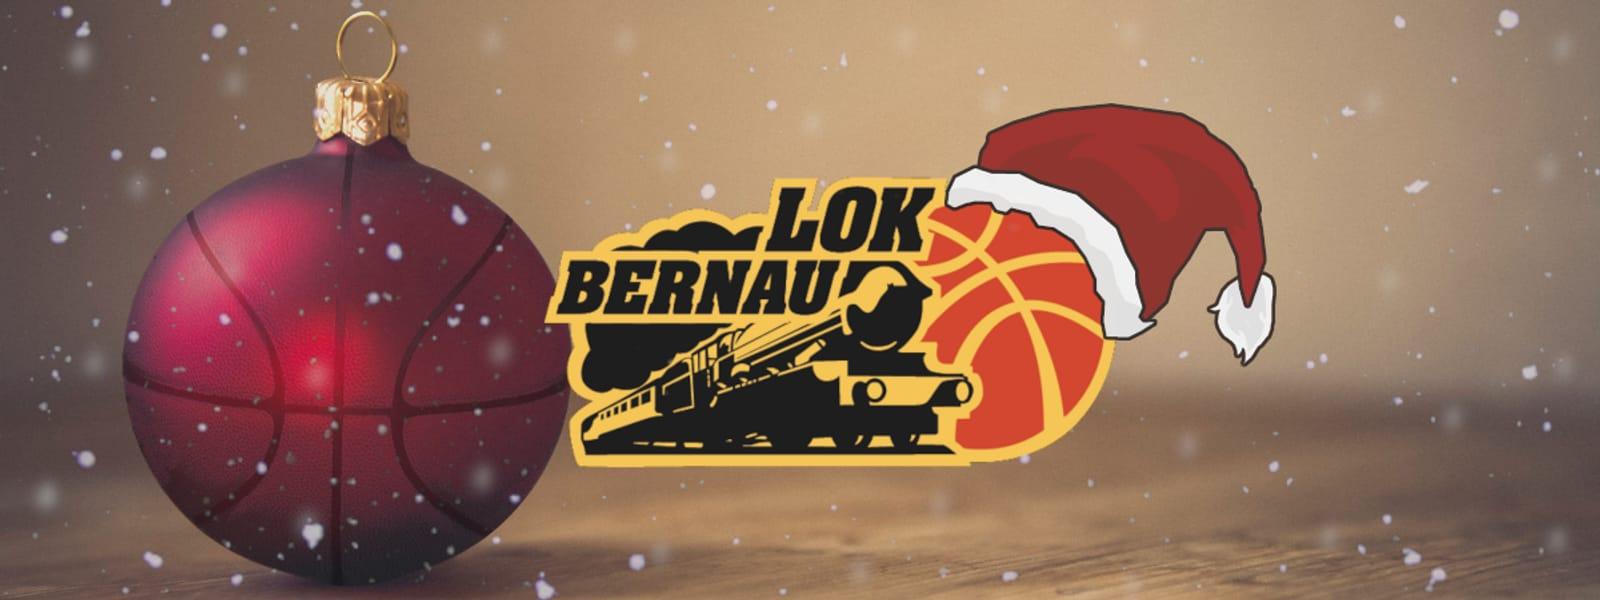 LOK Bernau Weihnachtsfeier